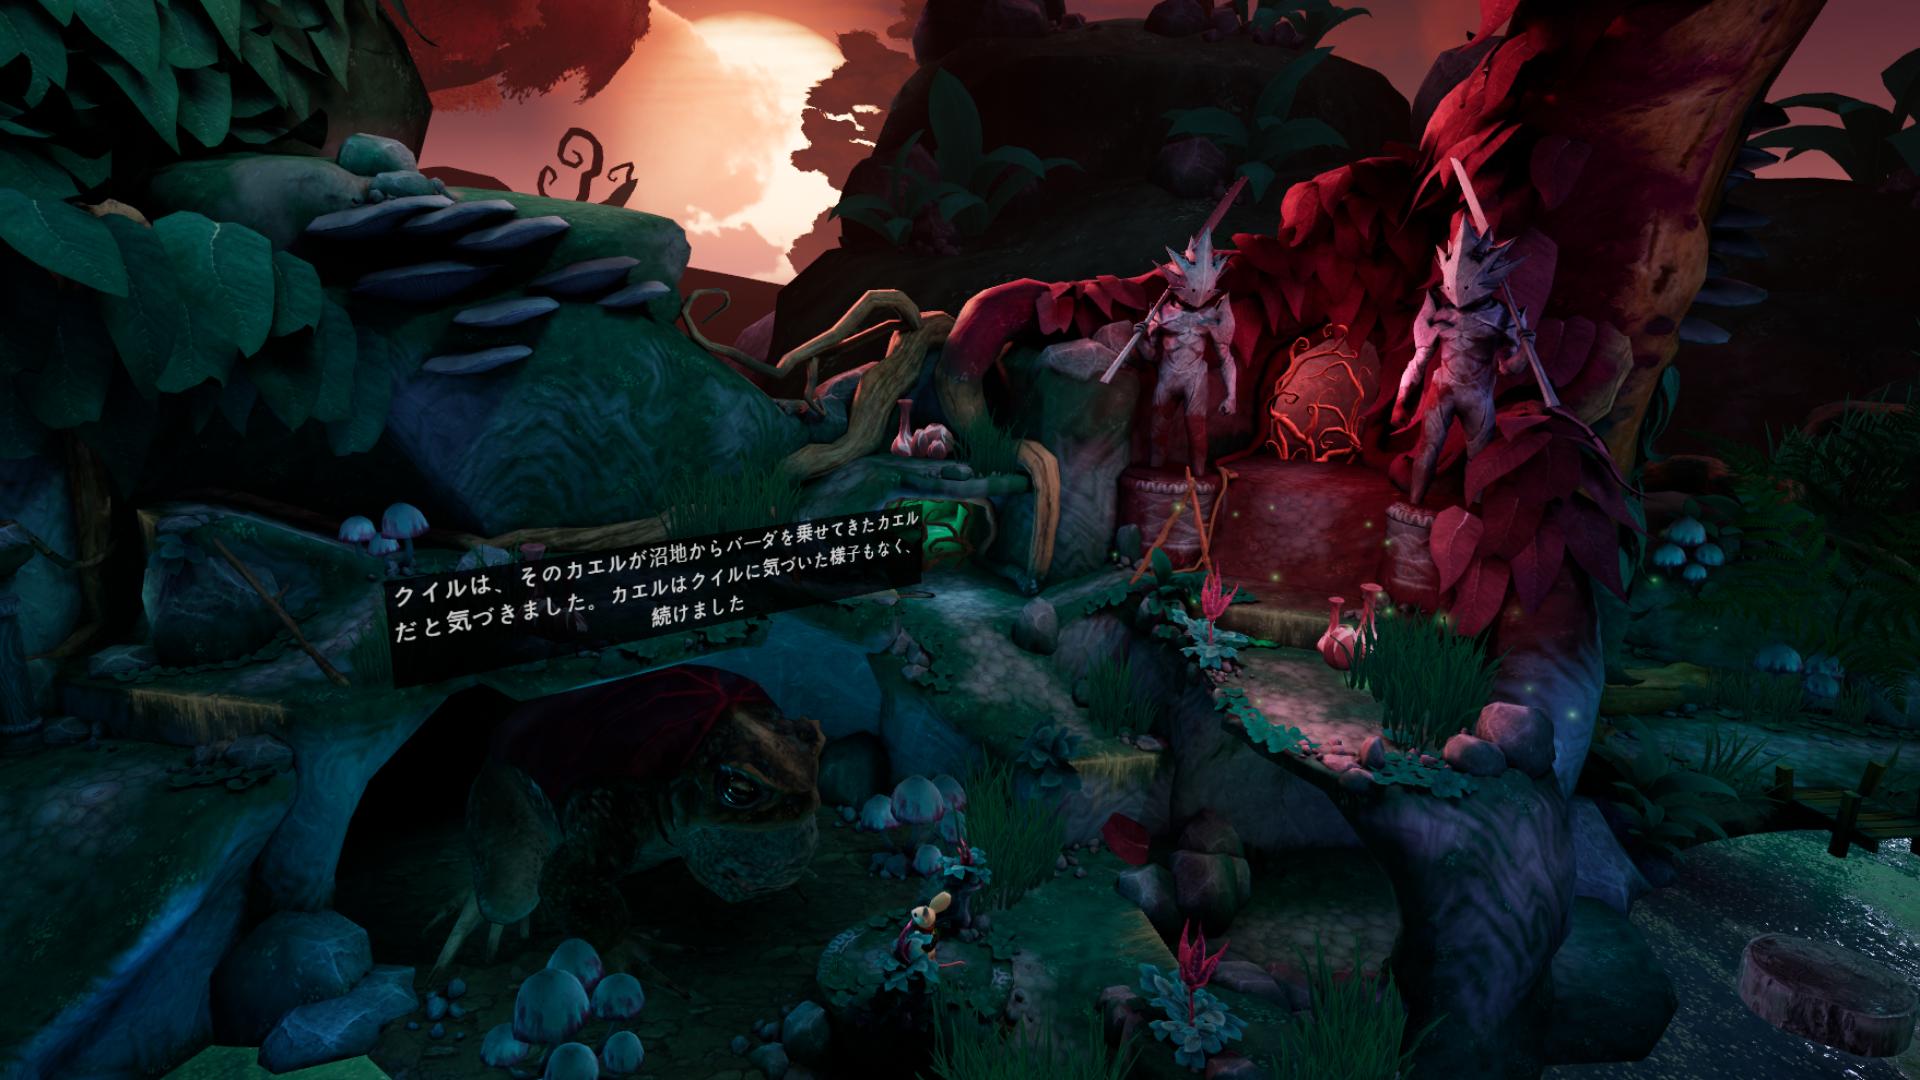 VRゲーム【Moss】幻想的な映像が素晴らしい!